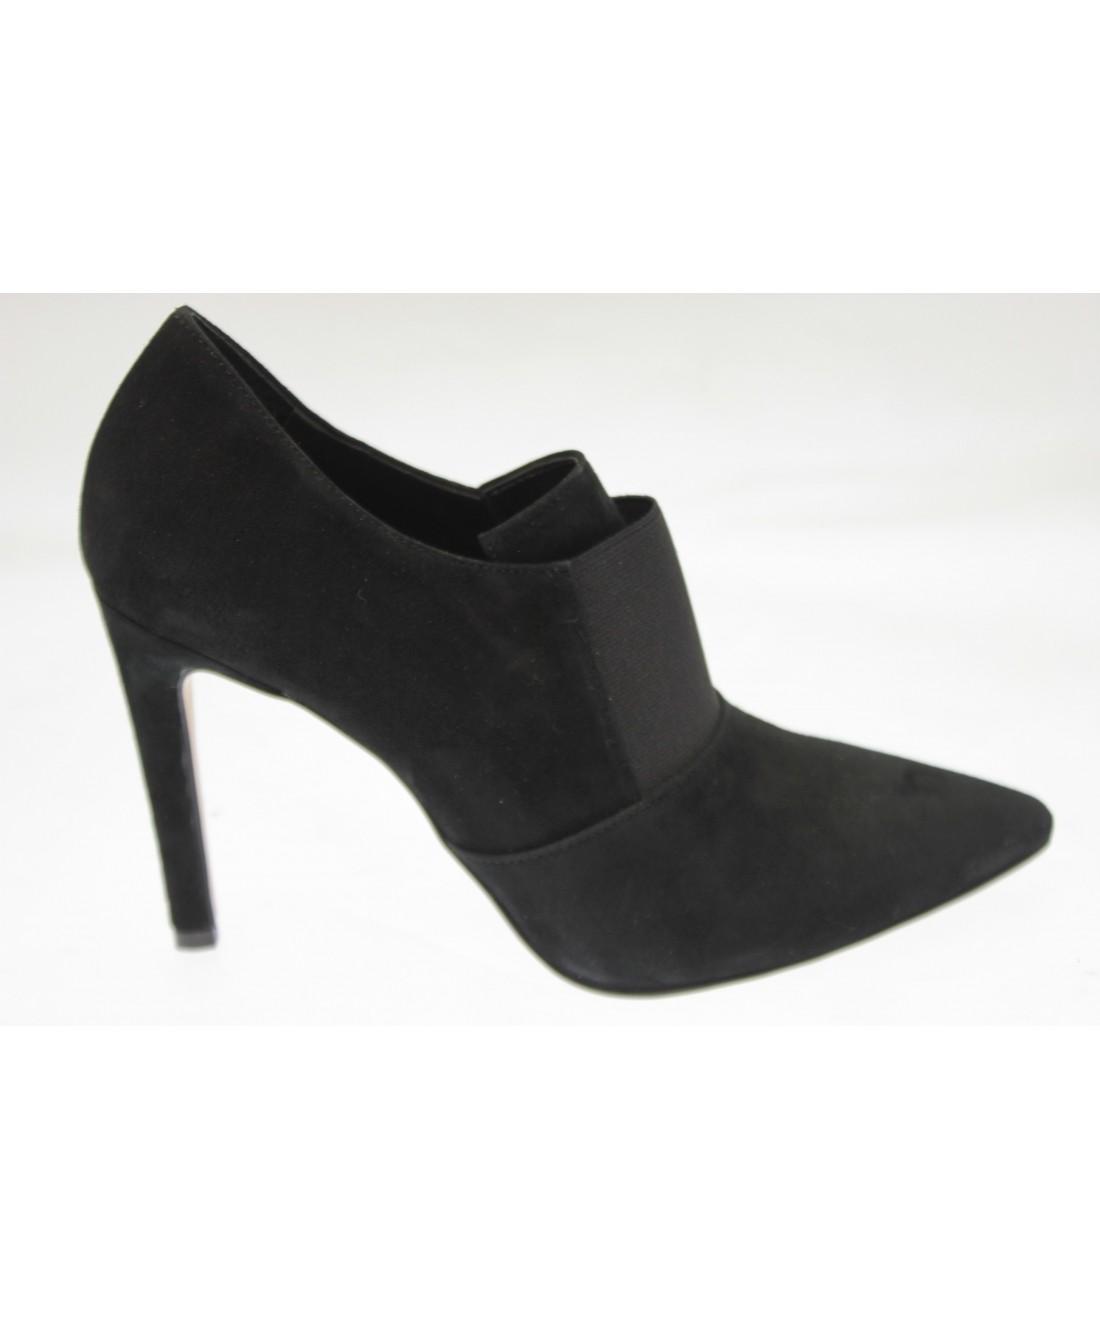 2 en 1 bottine escarpin femme daim noir petit talon osmose shoes. Black Bedroom Furniture Sets. Home Design Ideas